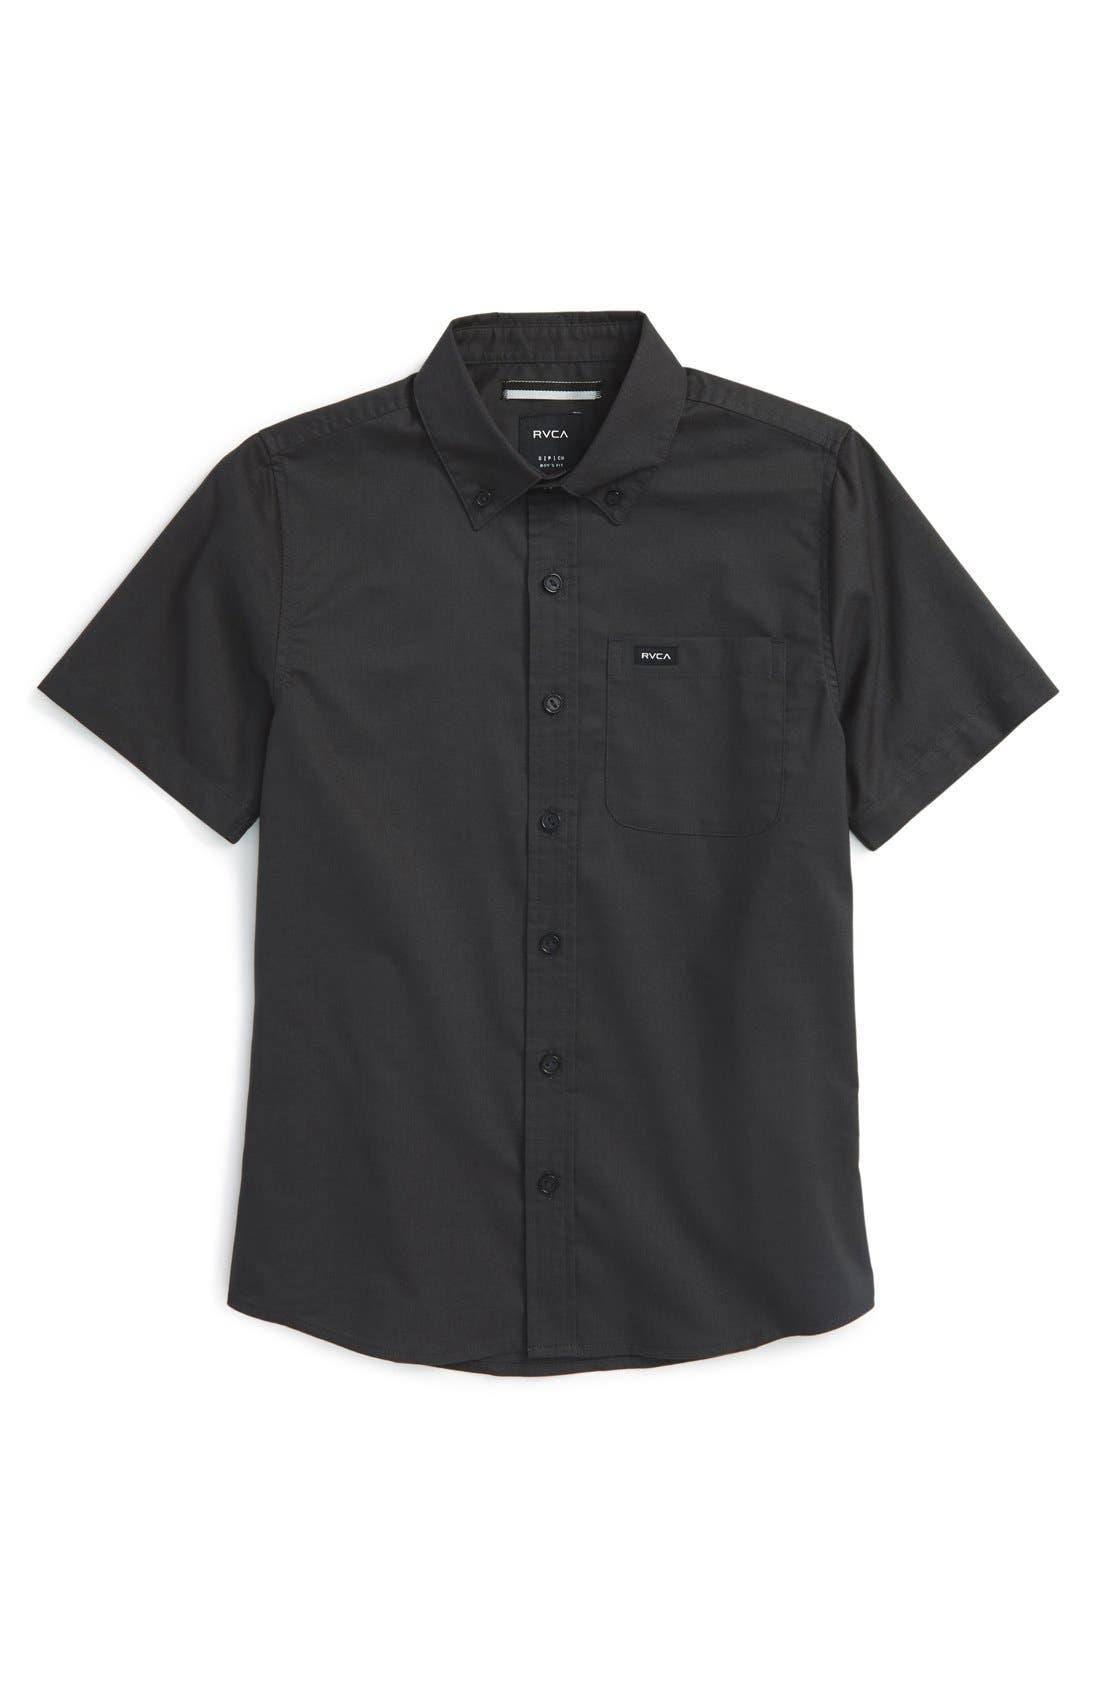 'That'll Do' Woven Shirt,                             Main thumbnail 9, color,